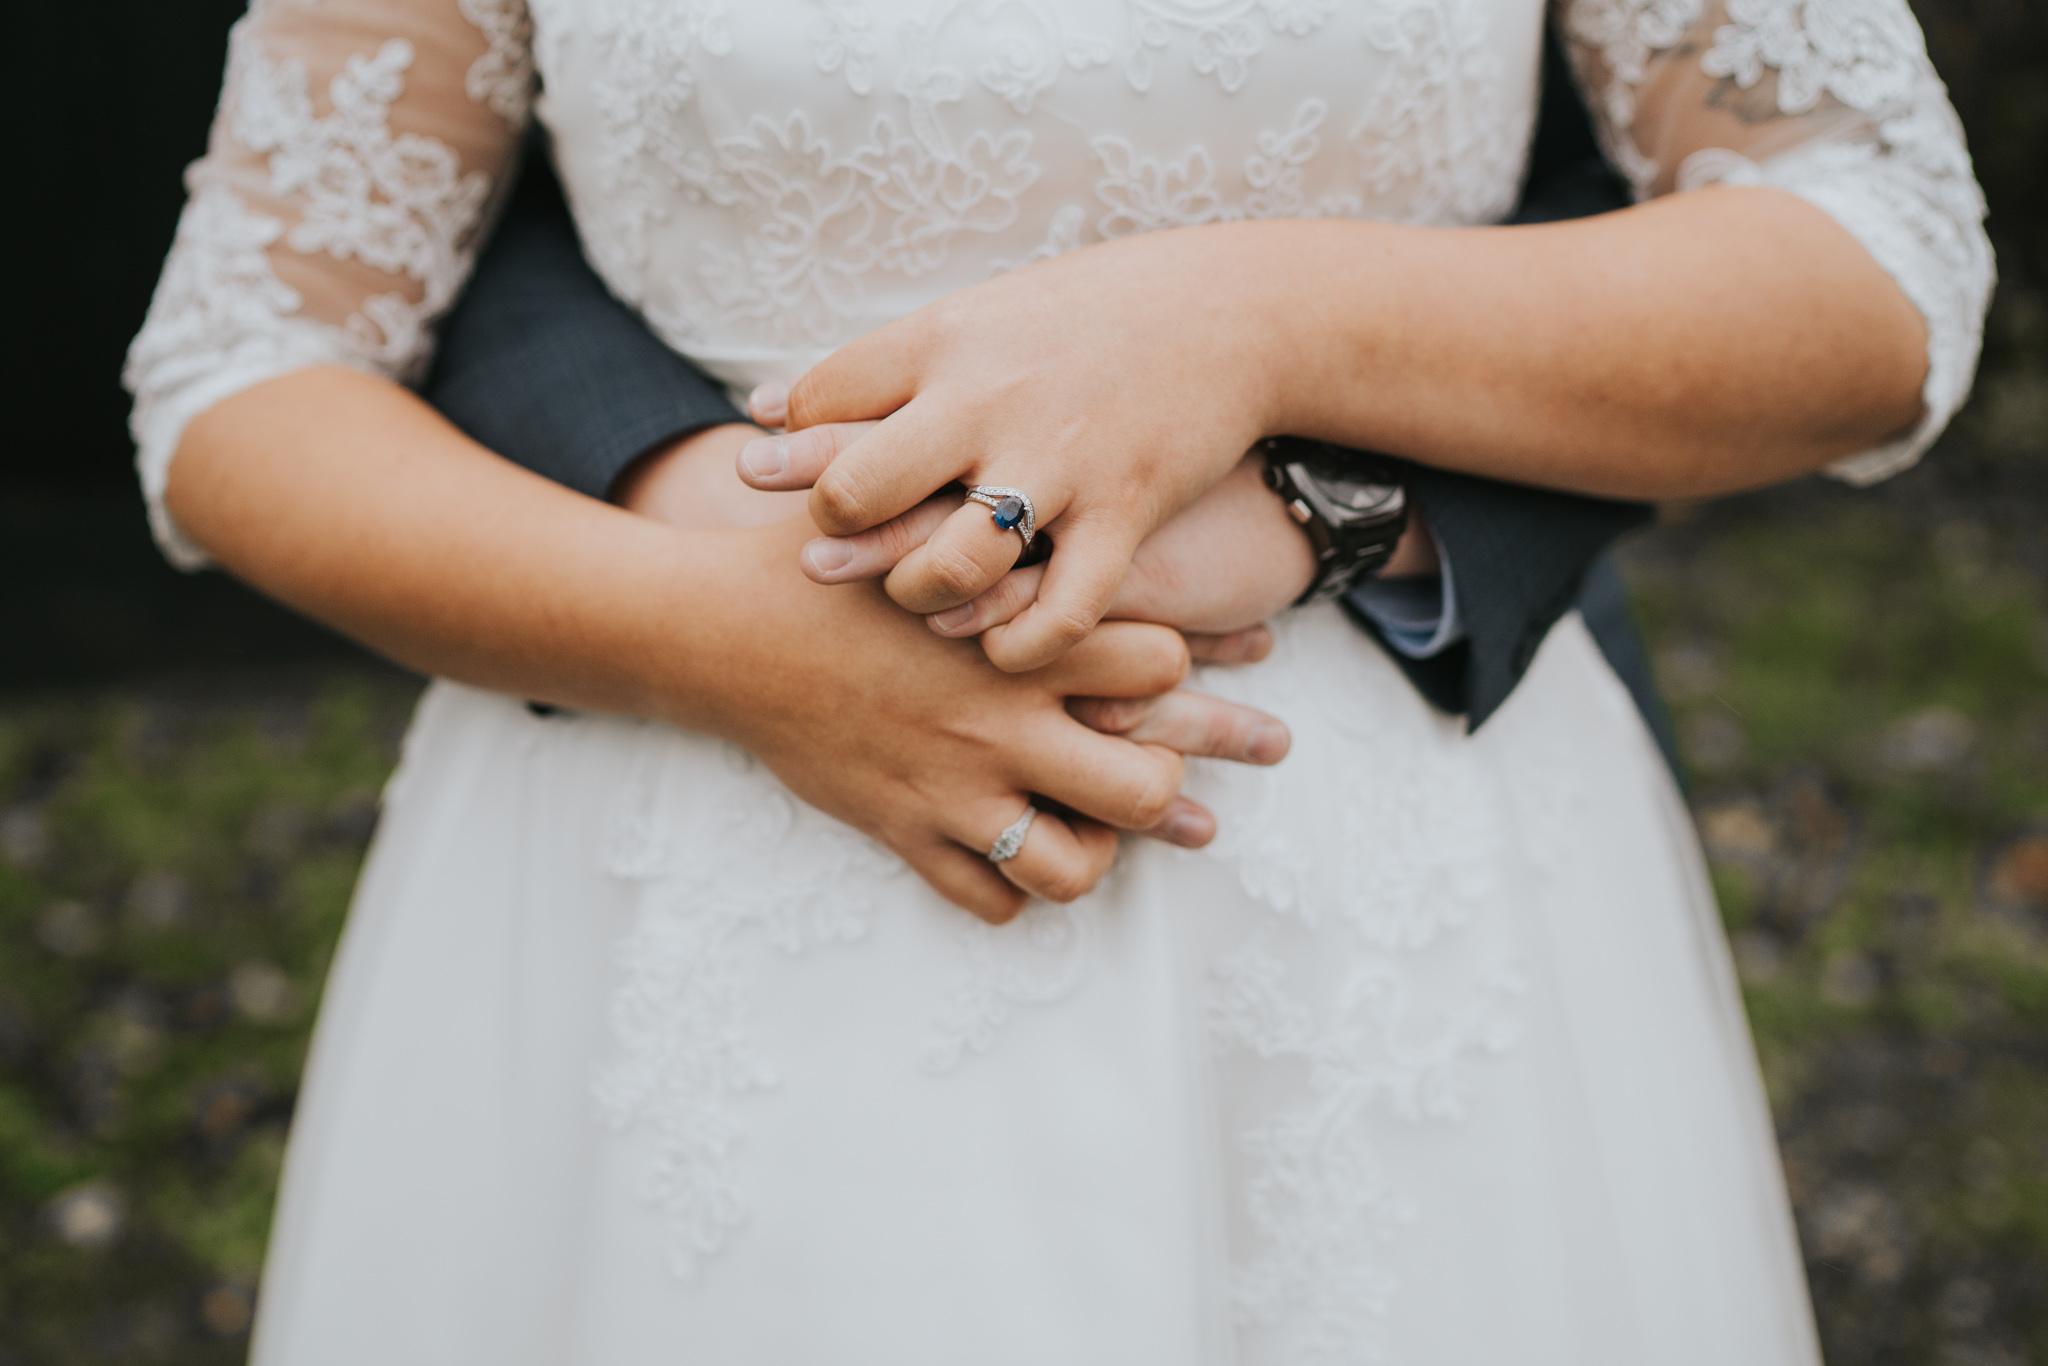 rhia-james-rustic-crabbs-barn-vintage-50s-retro-wedding-grace-elizabeth-colchester-essex-alternative-relaxed-wedding-family-photography-devon-suffolk-norfolk-essex (88 of 138).jpg